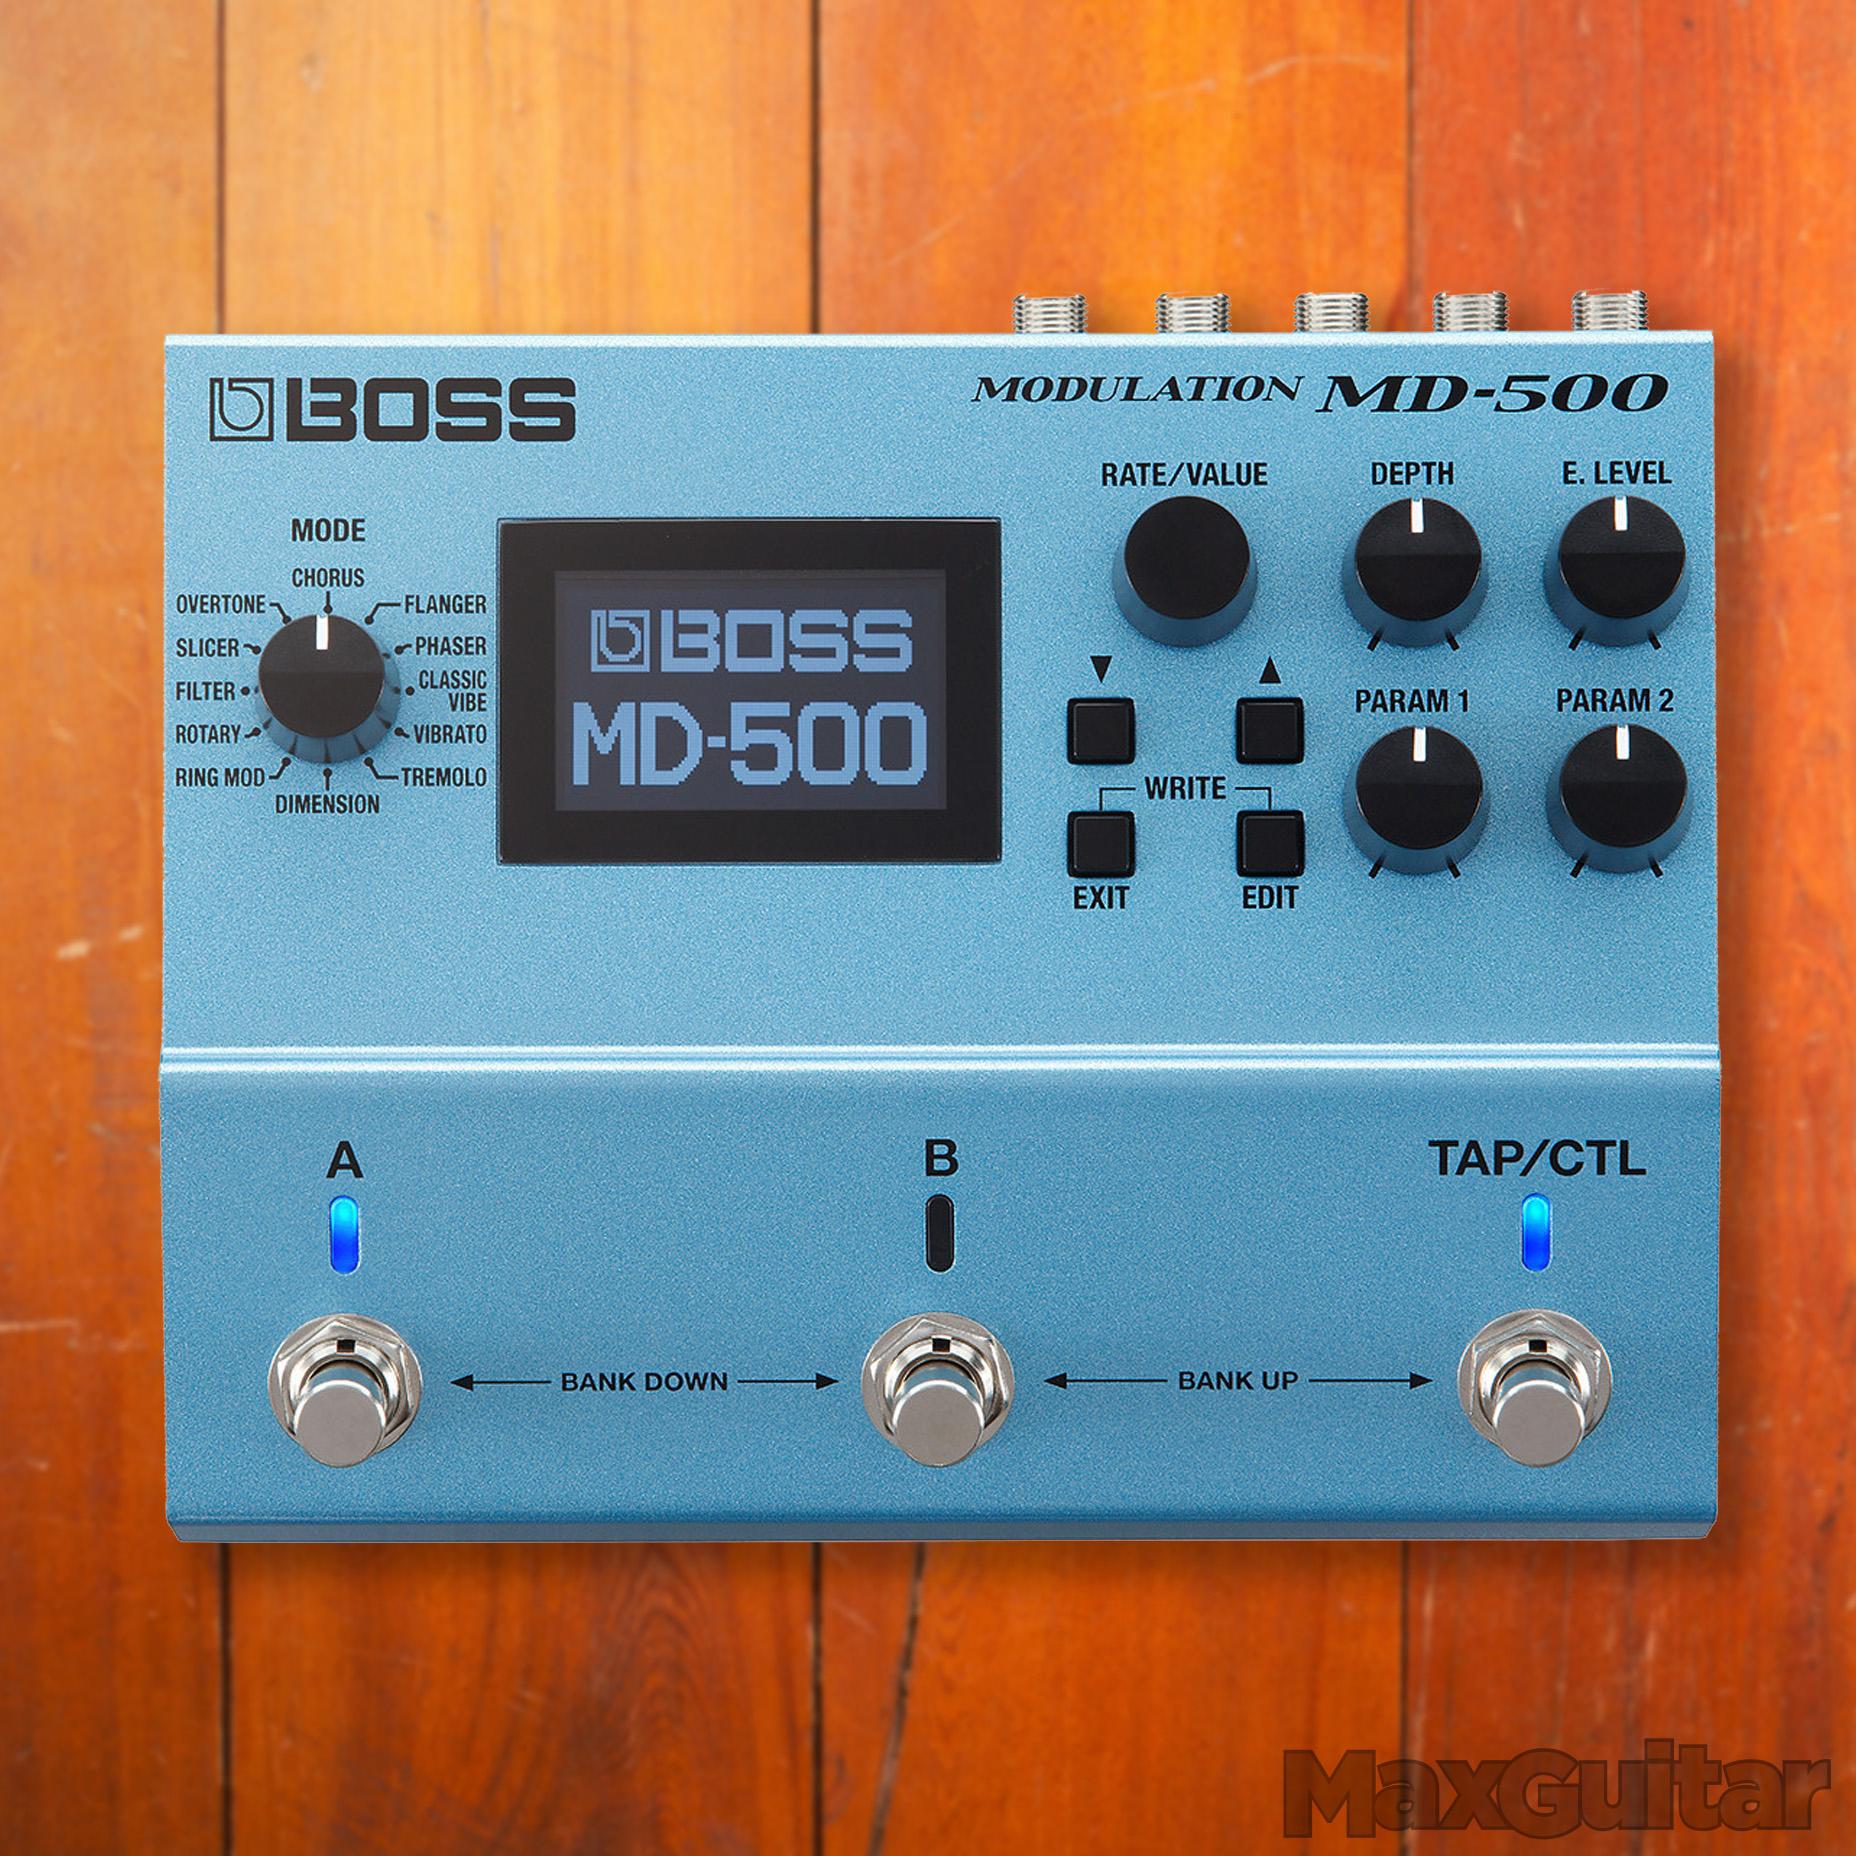 BOSS MD 500 Digital Modulation